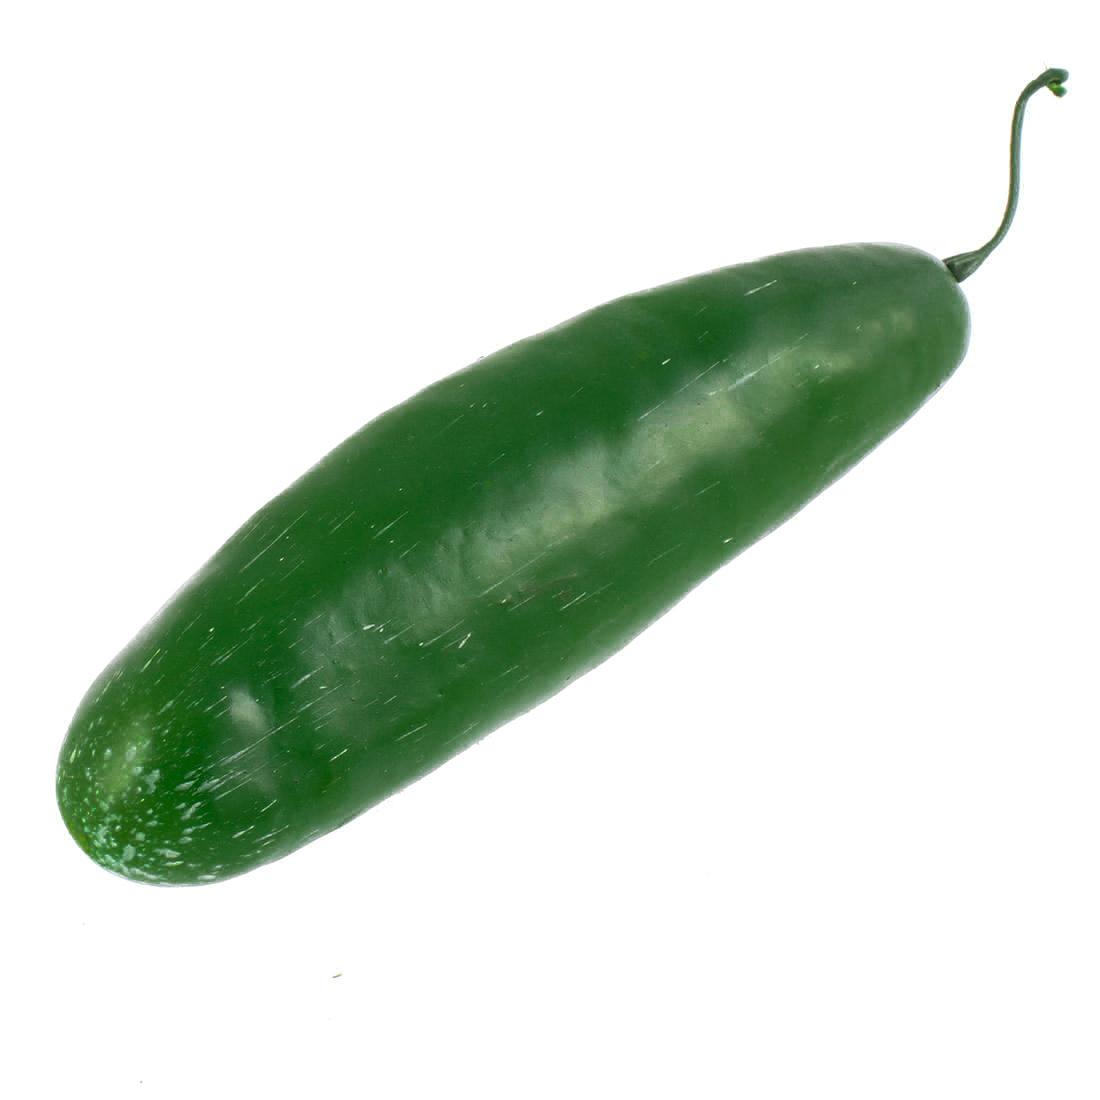 Artificial Plastic Cucumber Vegetables House Party Kitchen Decor